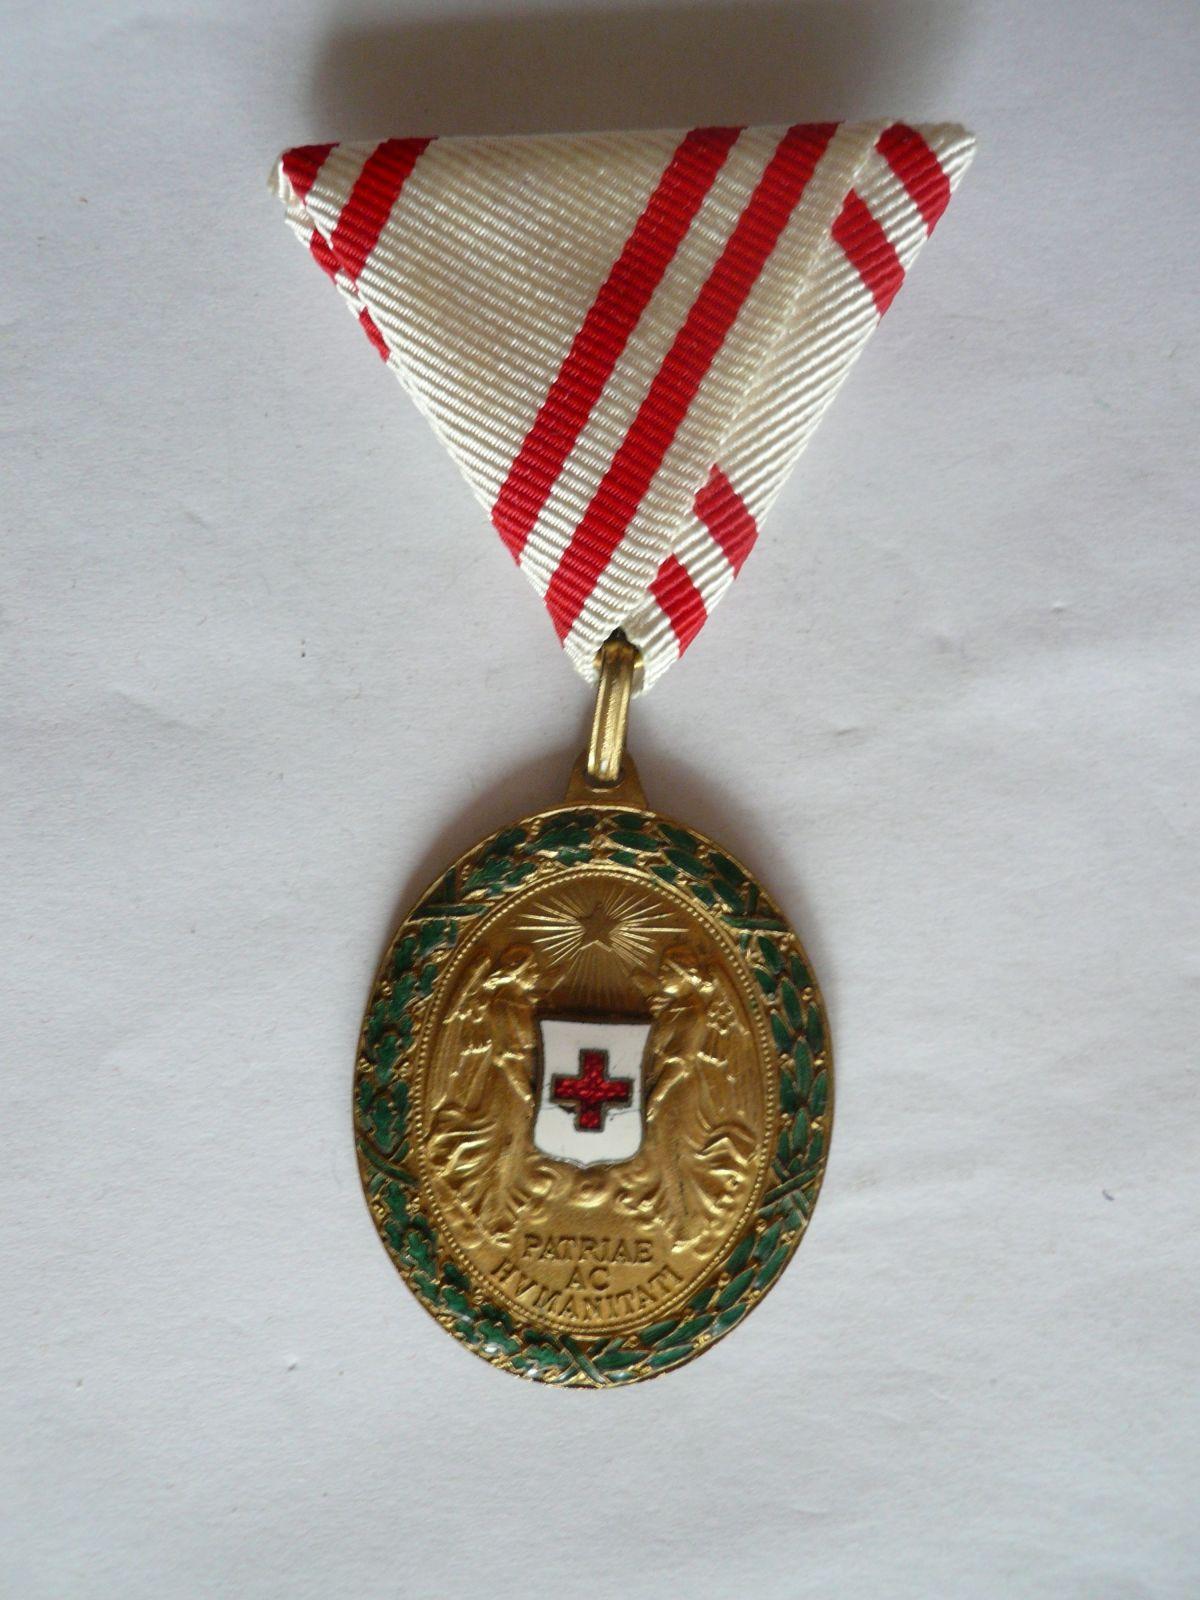 Záslužná medaile ČK, zlacený bronz, Rakousko